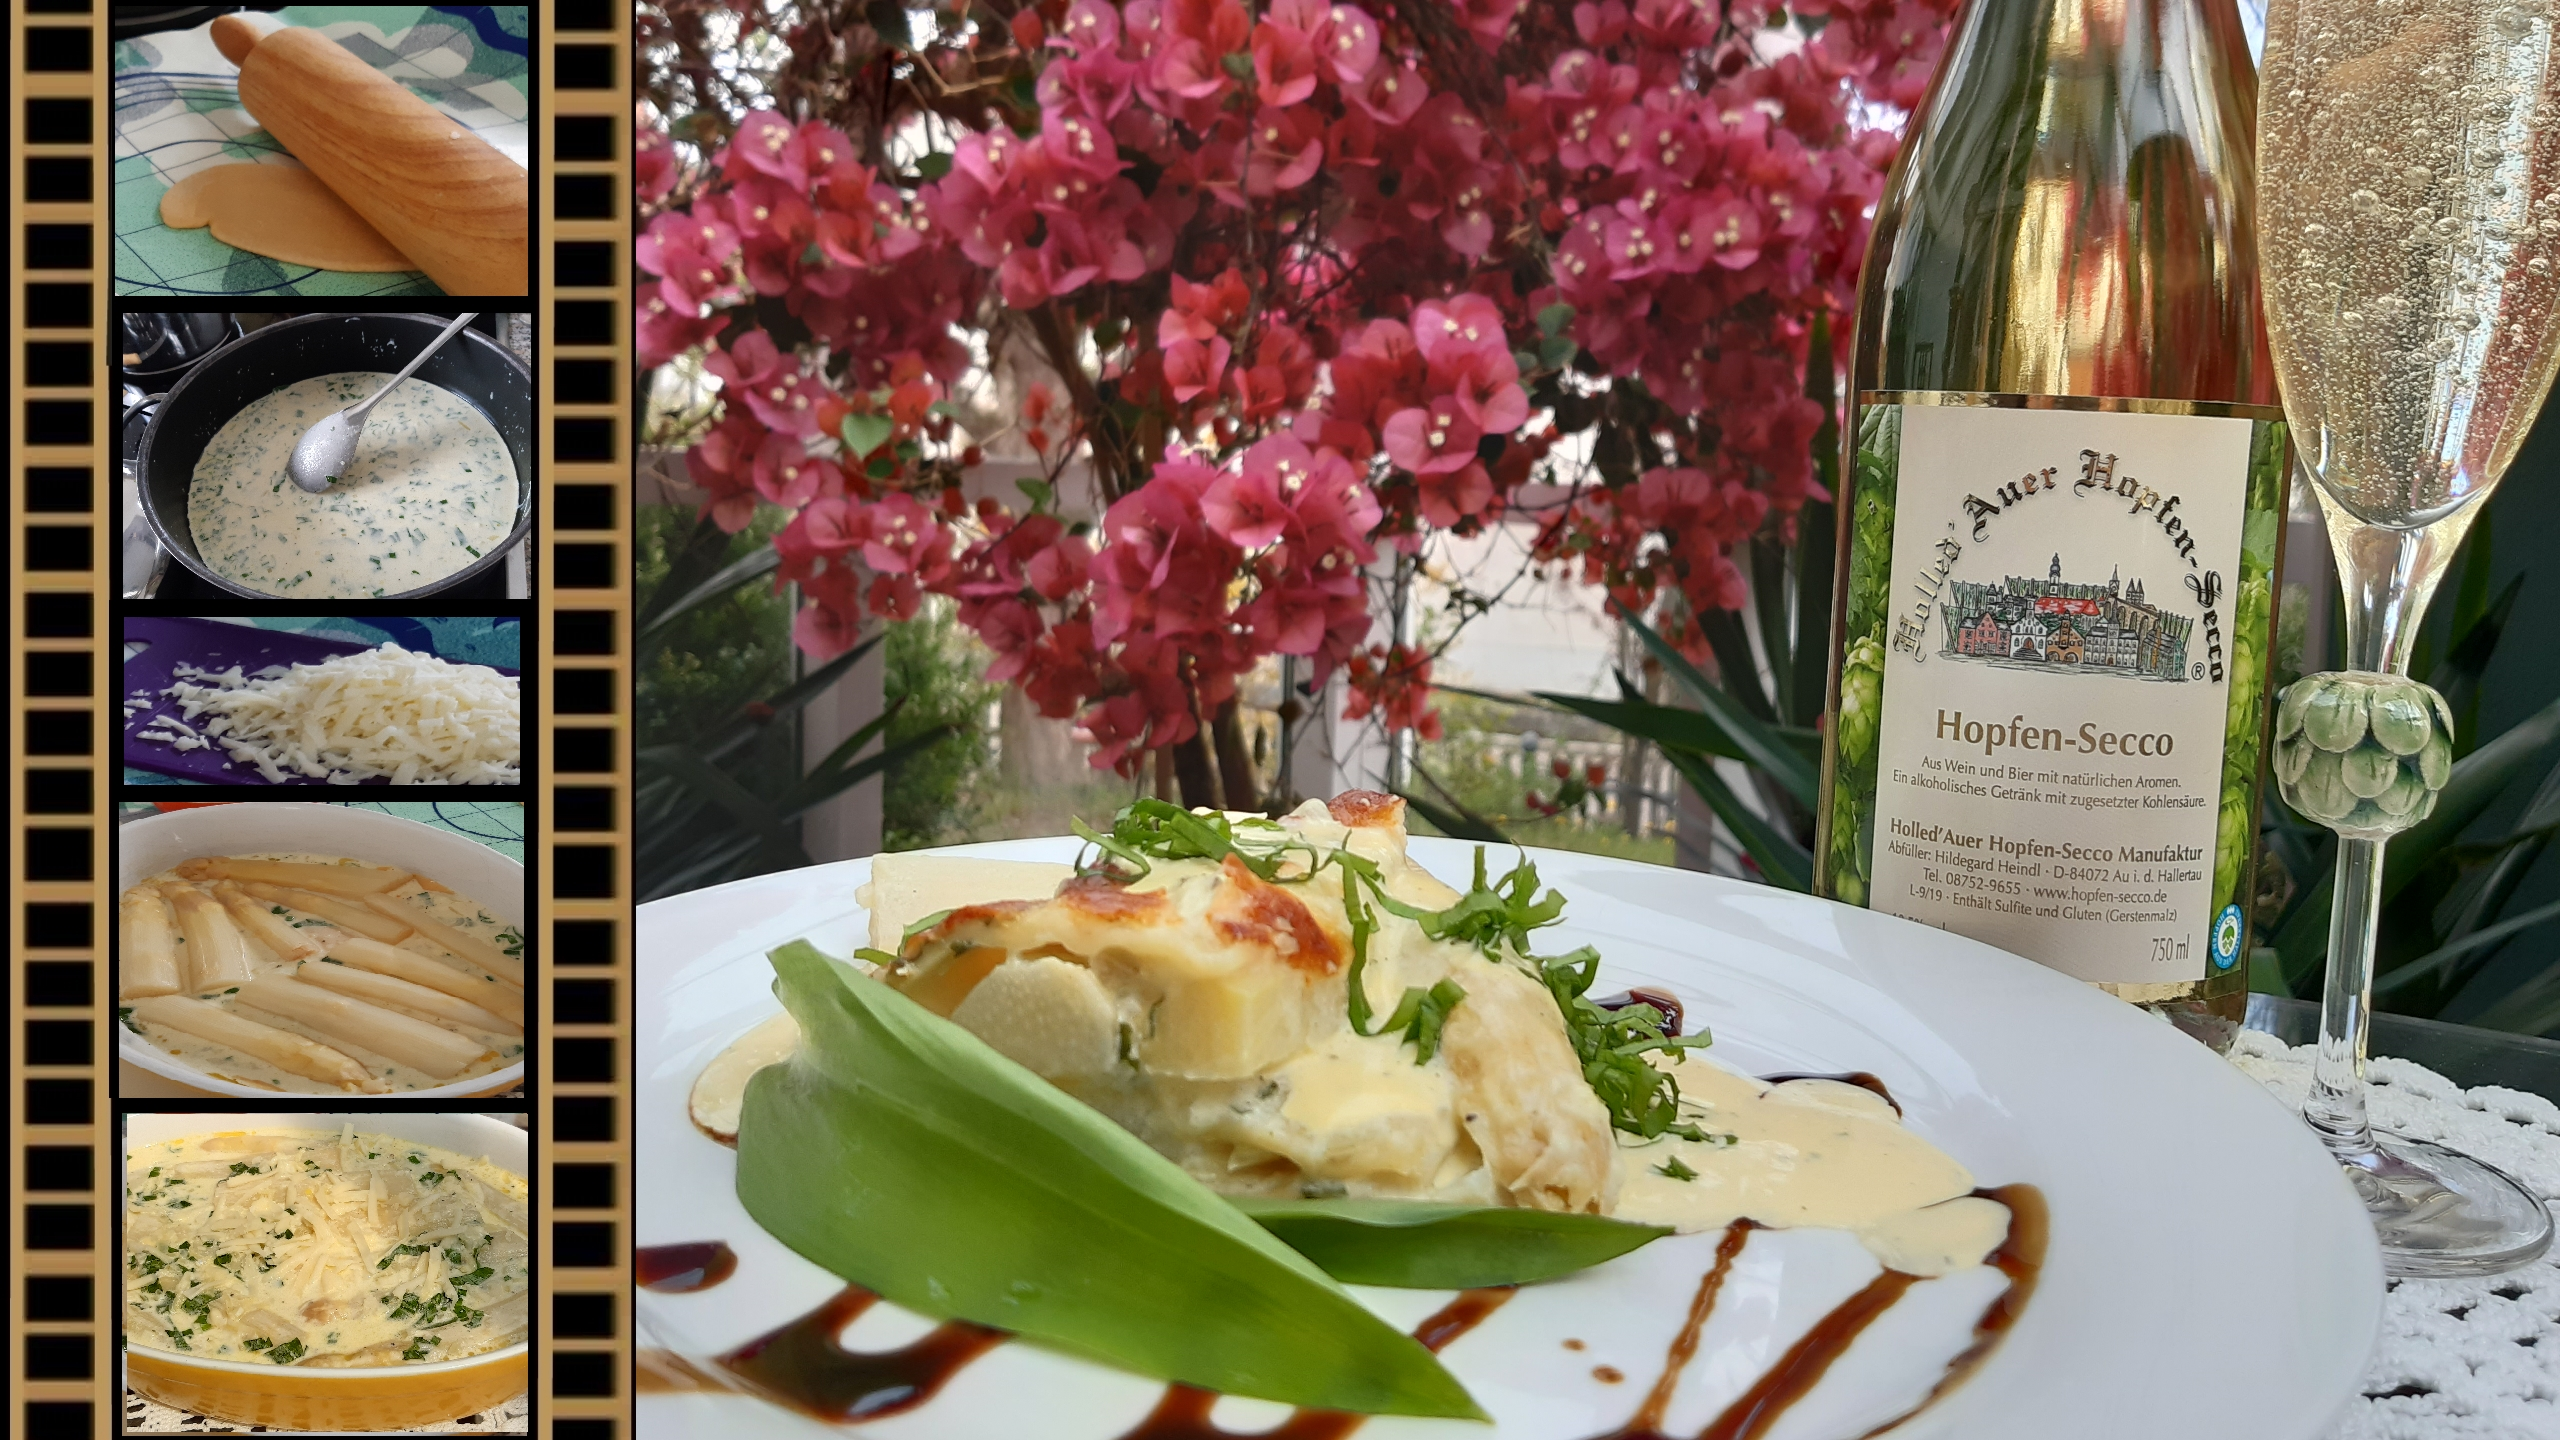 Spargel Lasagne mit Hopfen-Secco